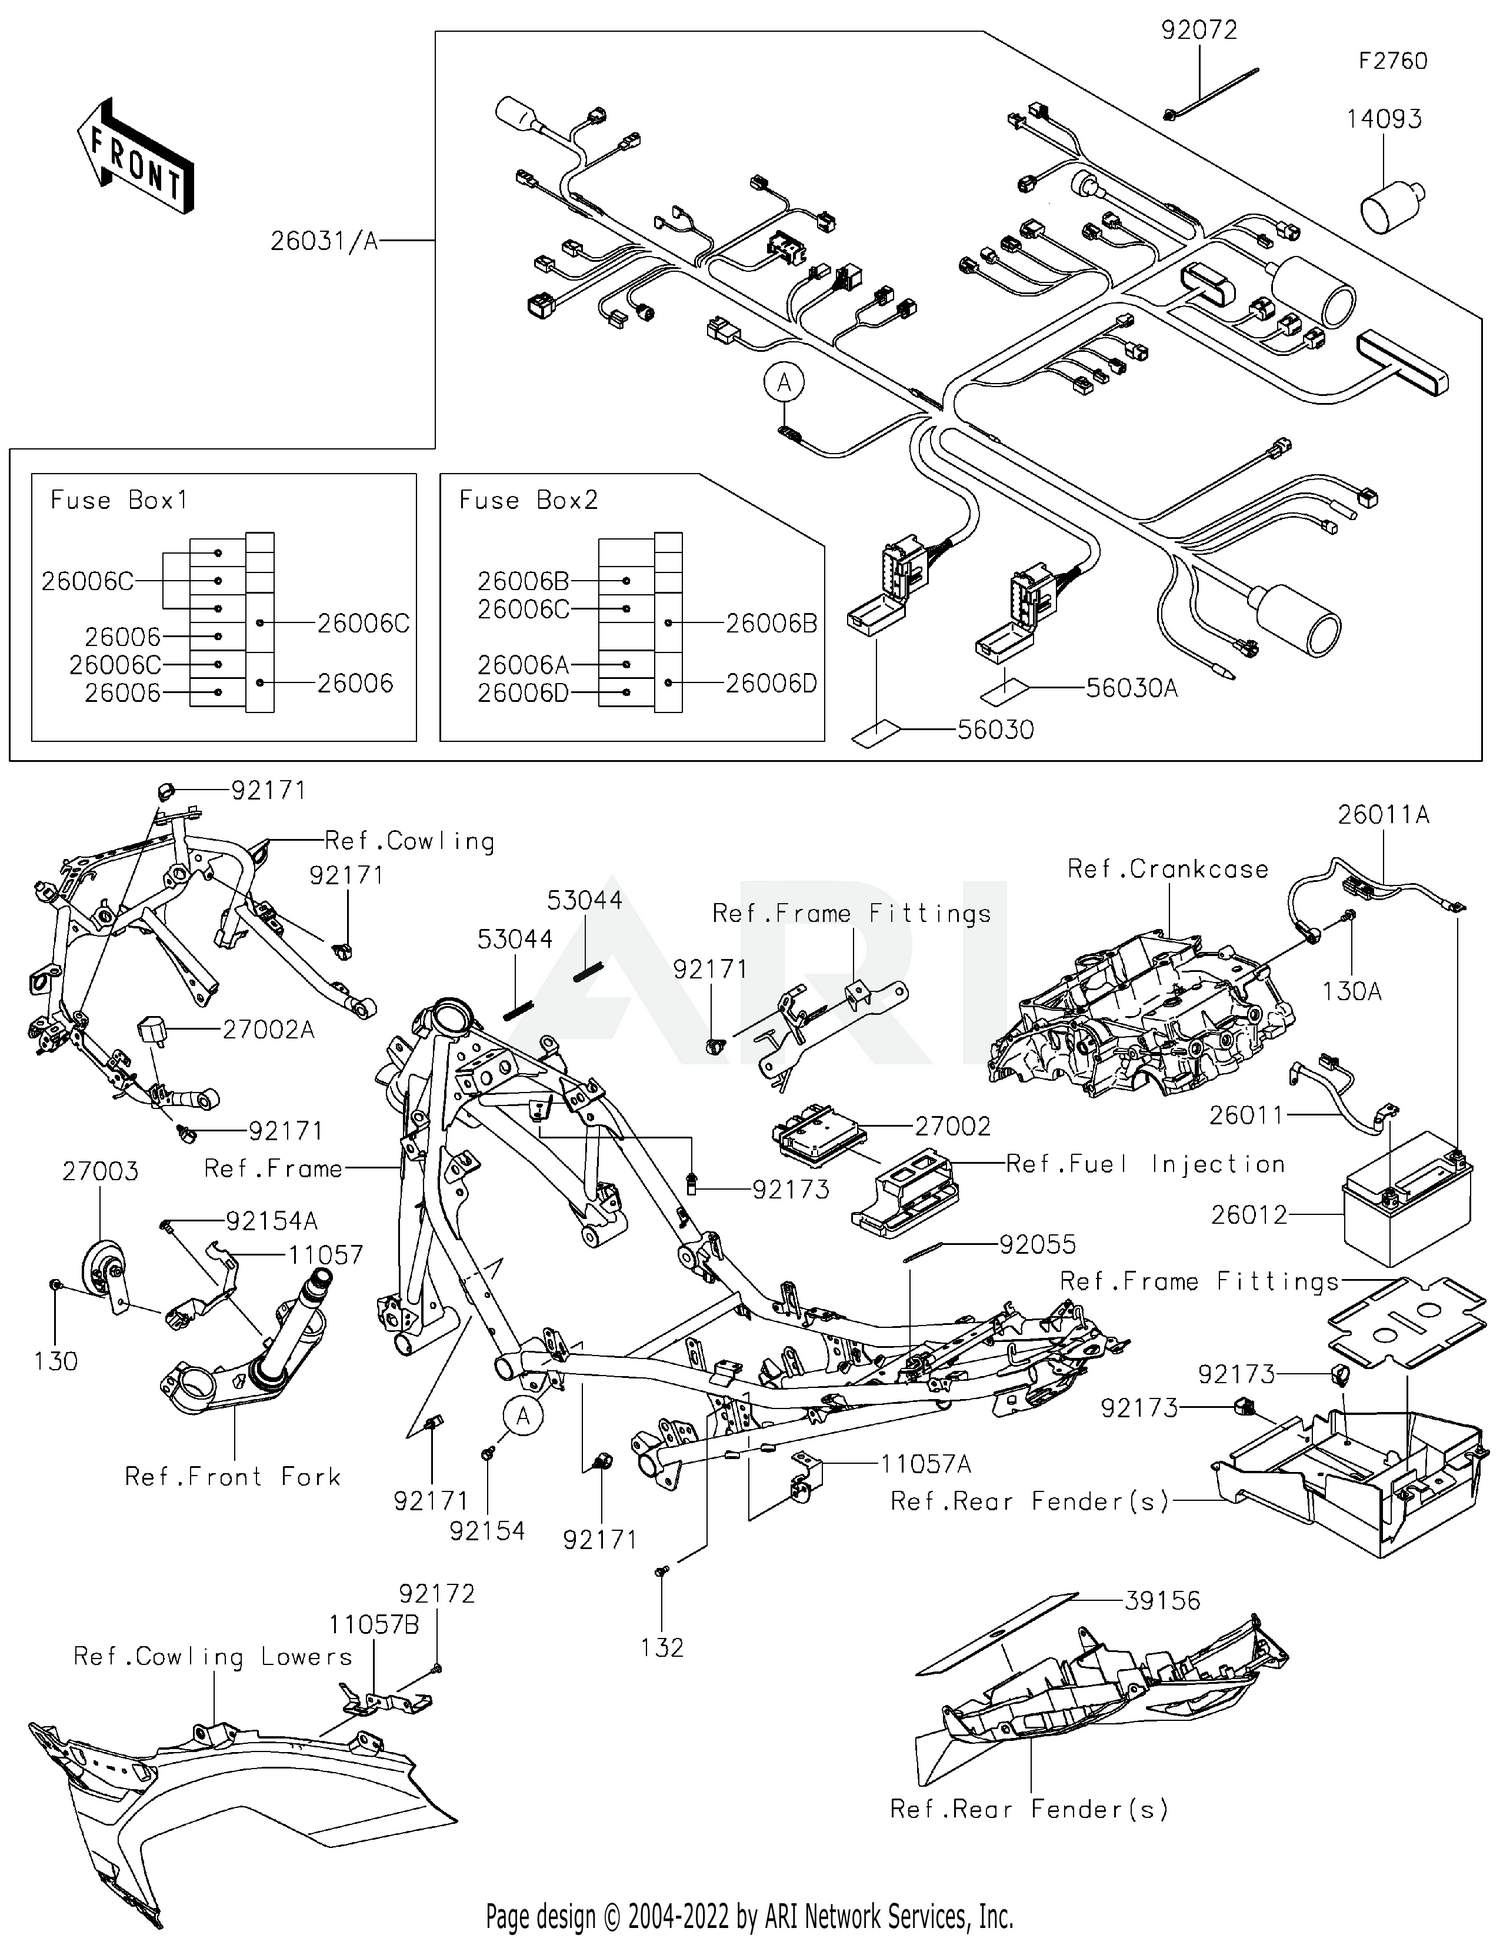 kawasaki 400 wiring diagram, - Style Guru: Fashion, Glitz ...